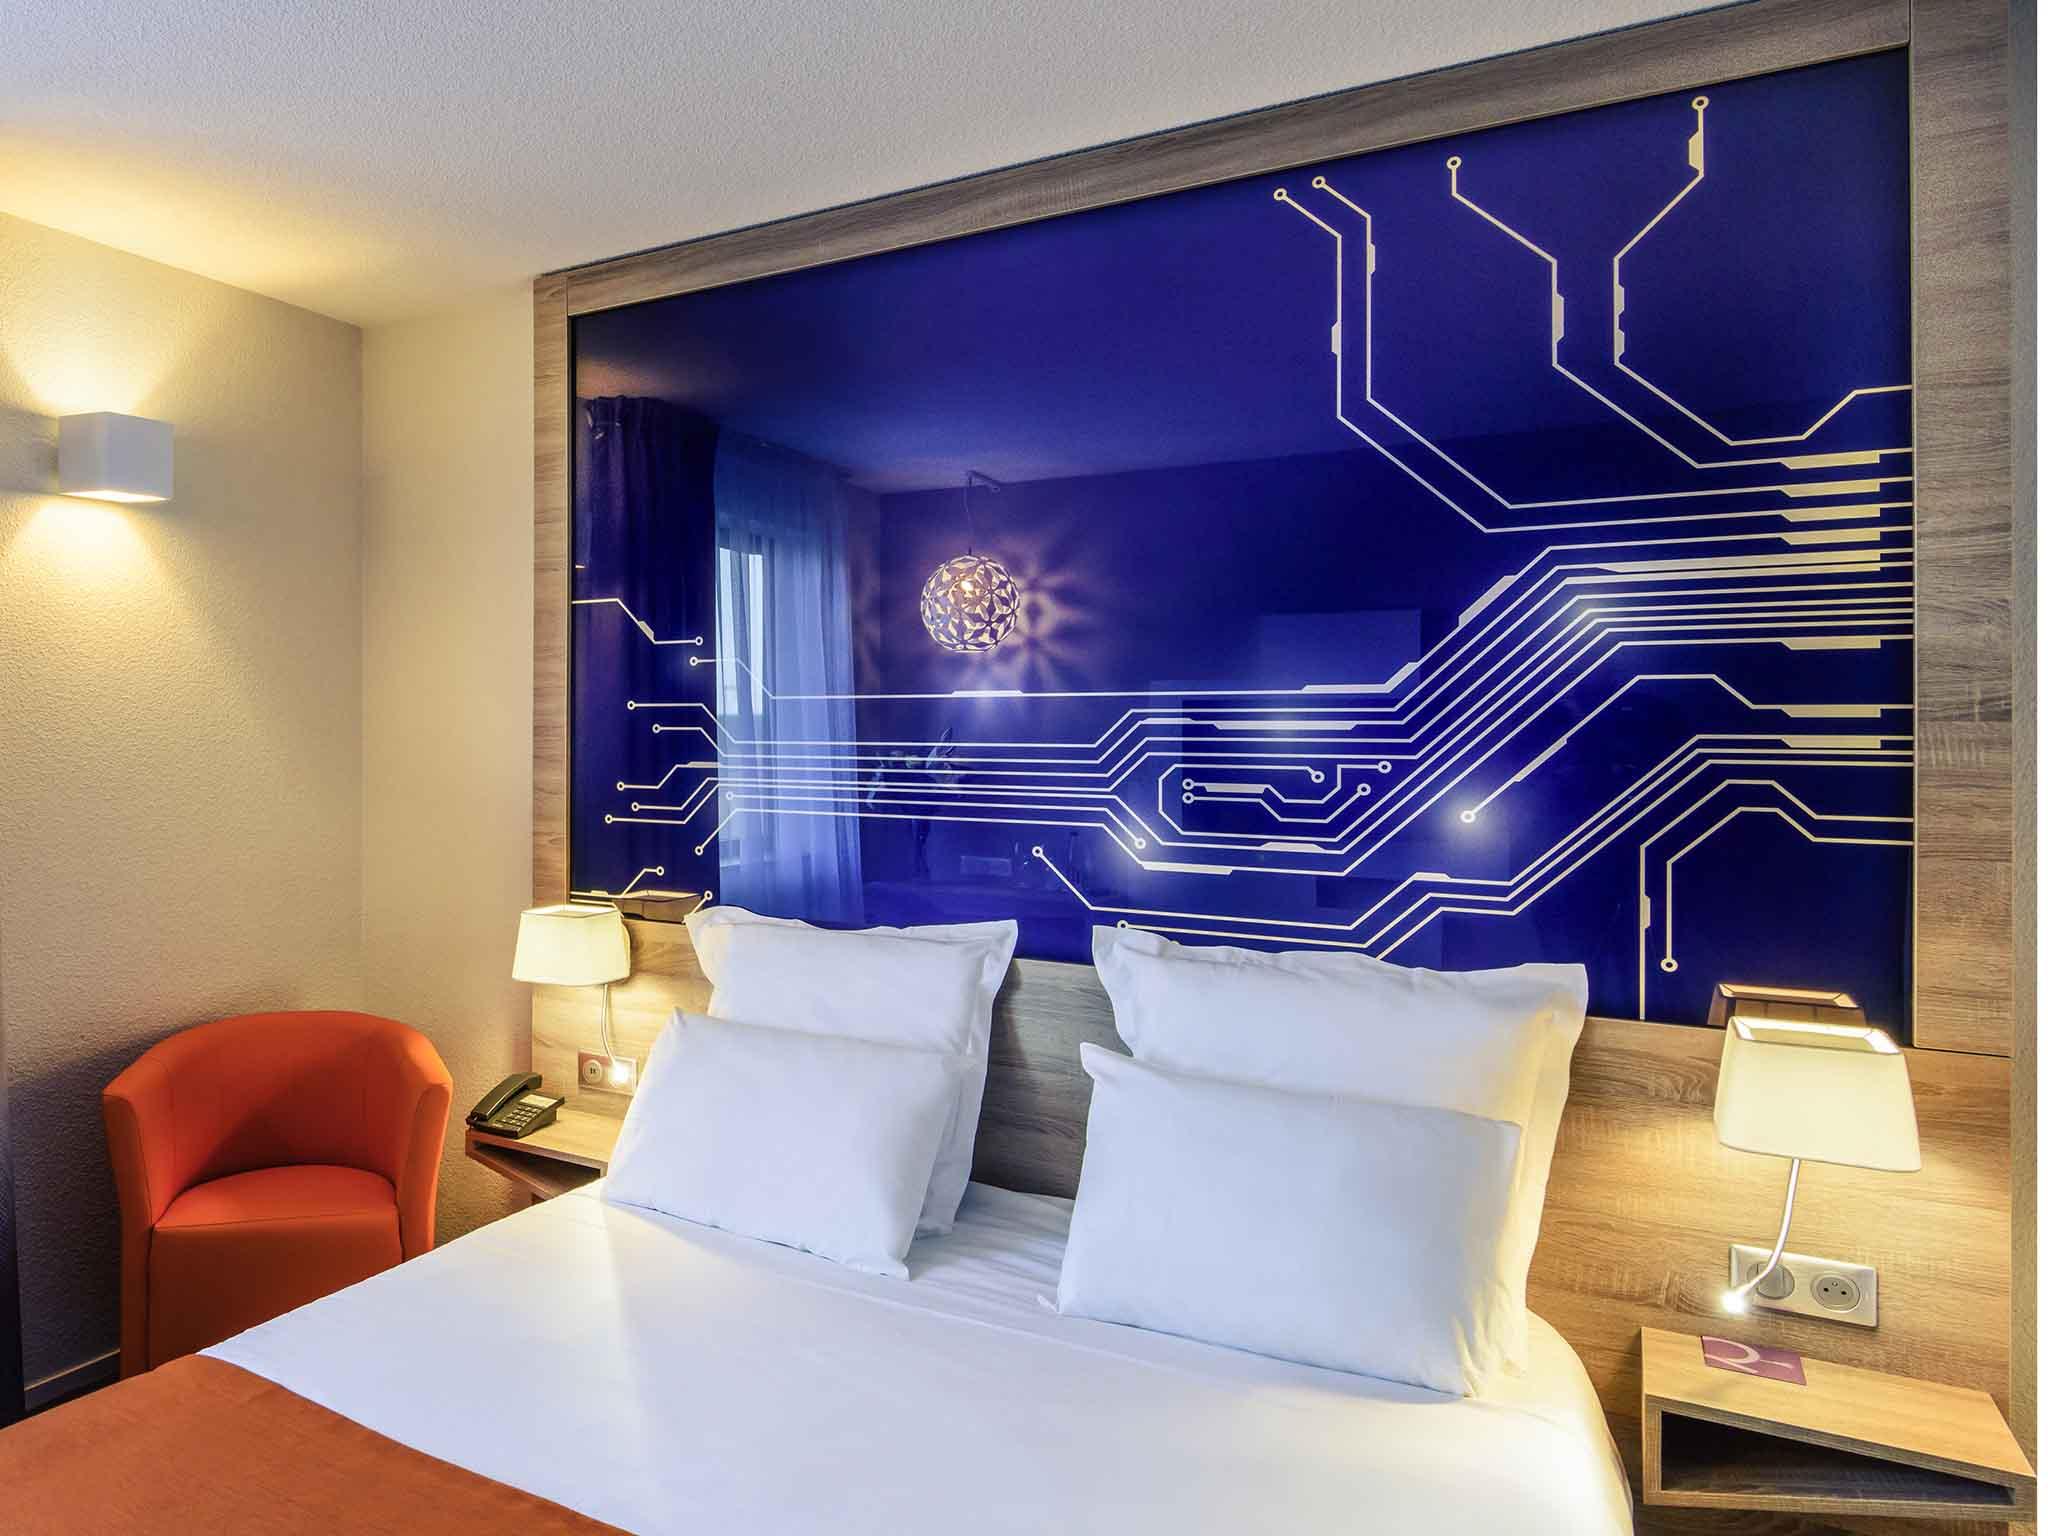 Отель — Hotel Mercure Пуатье Акватис Сит дю Футуроскоп